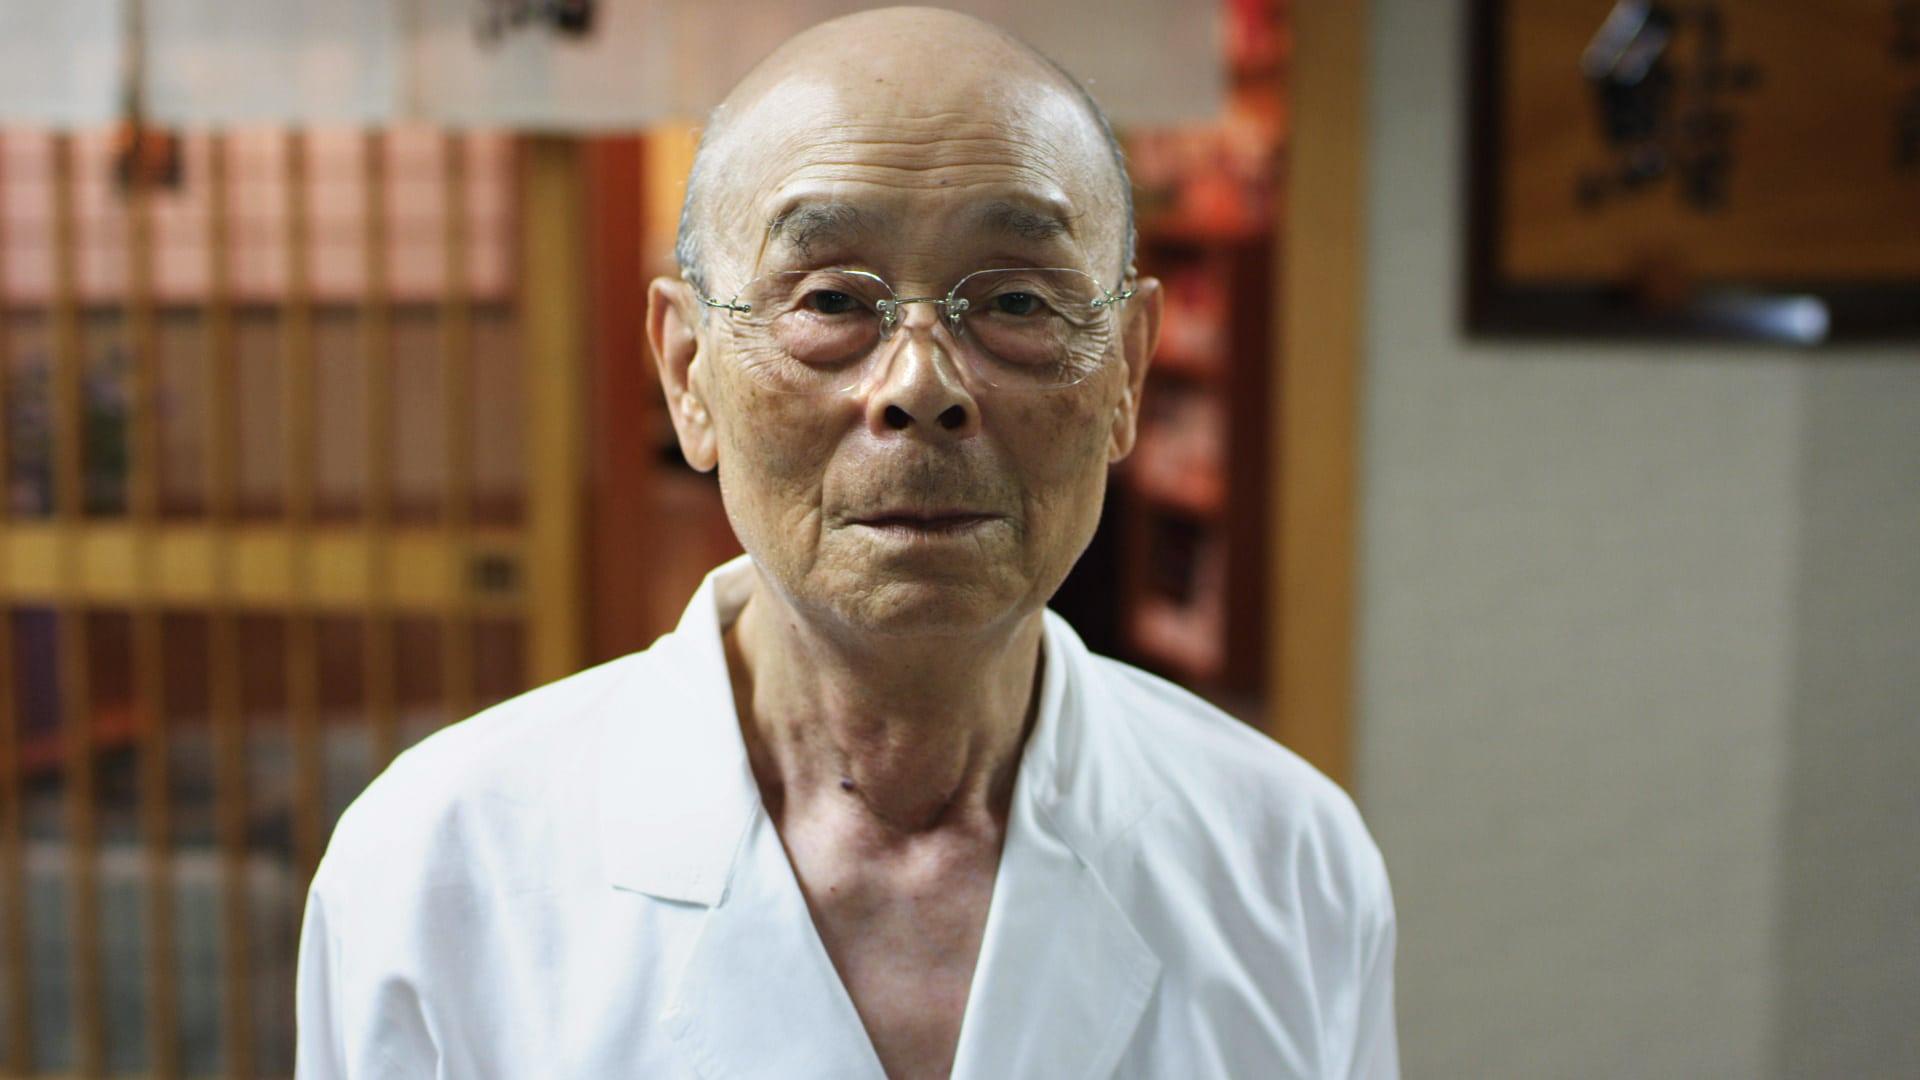 Jiro Ono in 'Jiro Dreams of Sushi,', a Magnolia Pictures release. Photo courtesy of Magnolia Pictures.